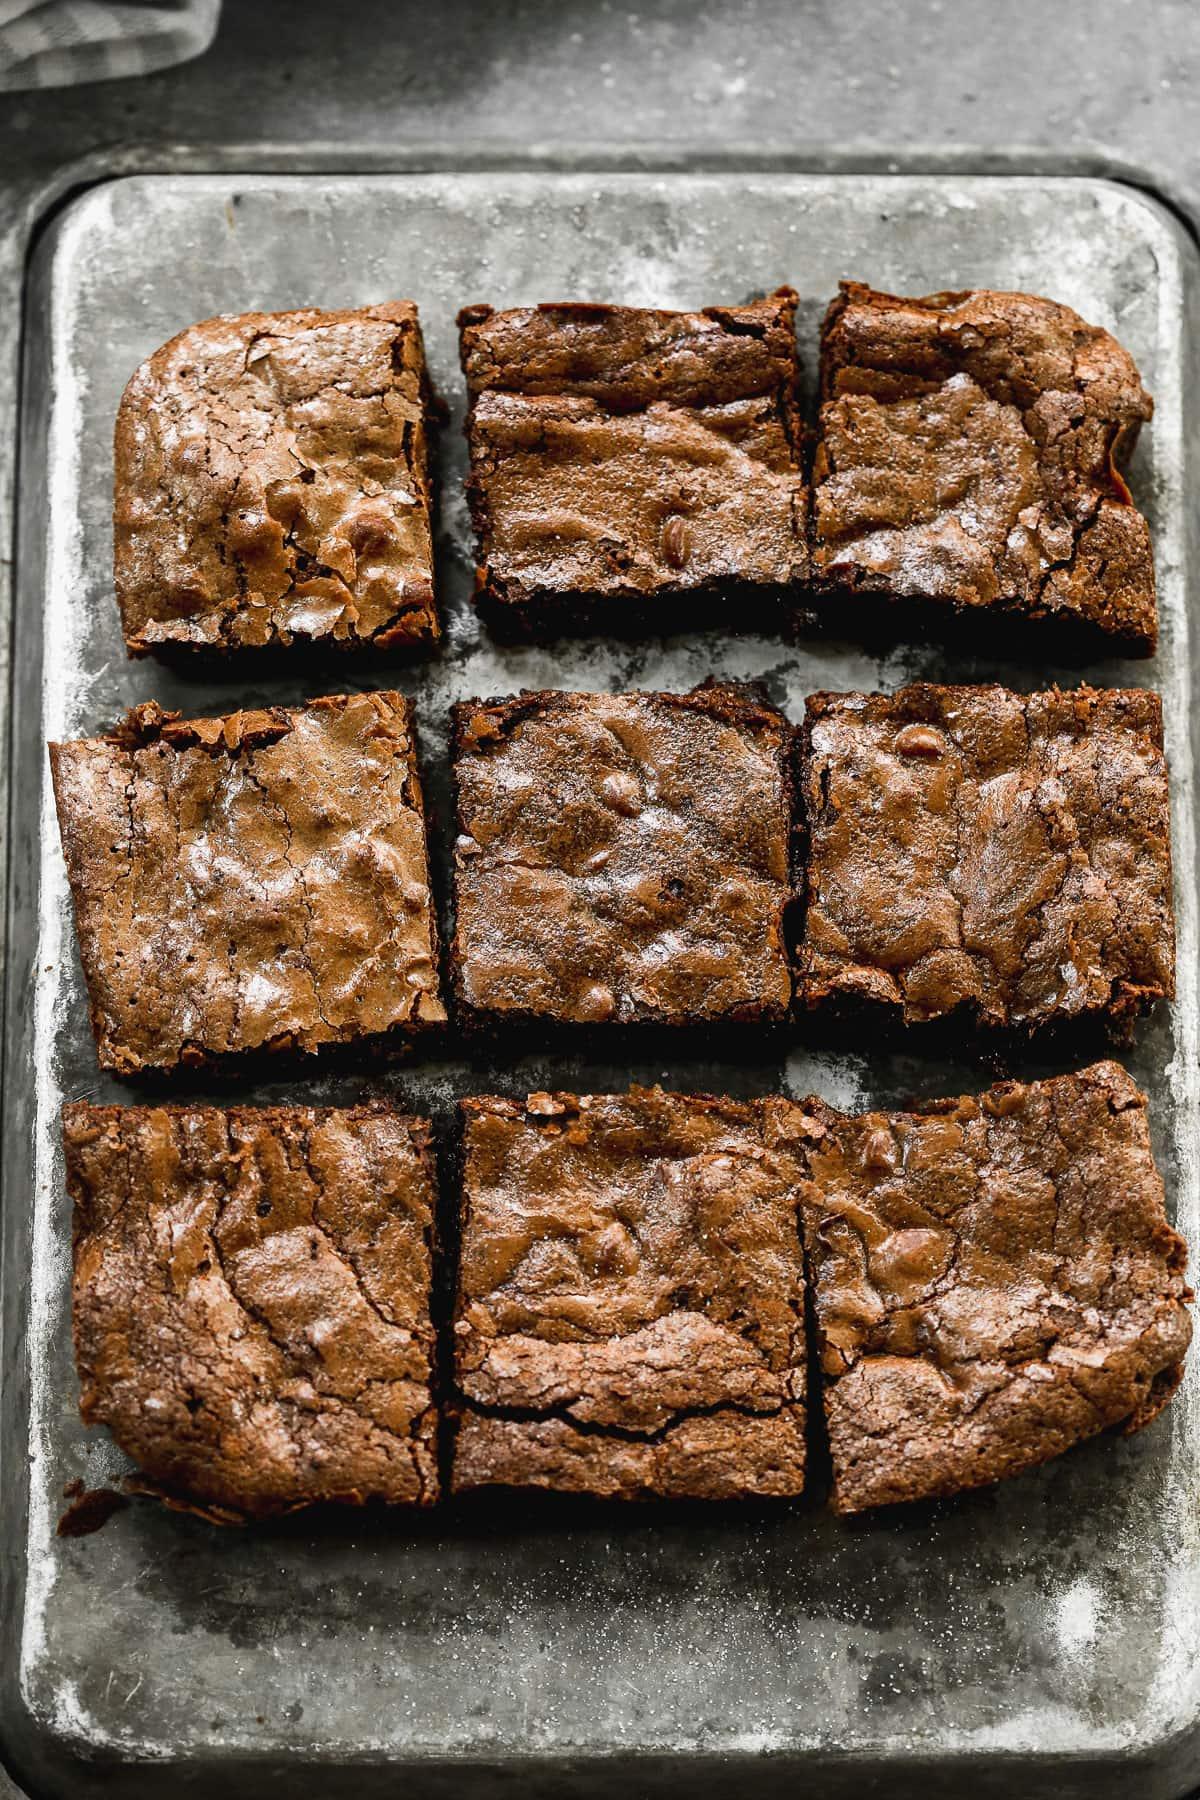 dense chocolate brownies cut into squares on baking sheet